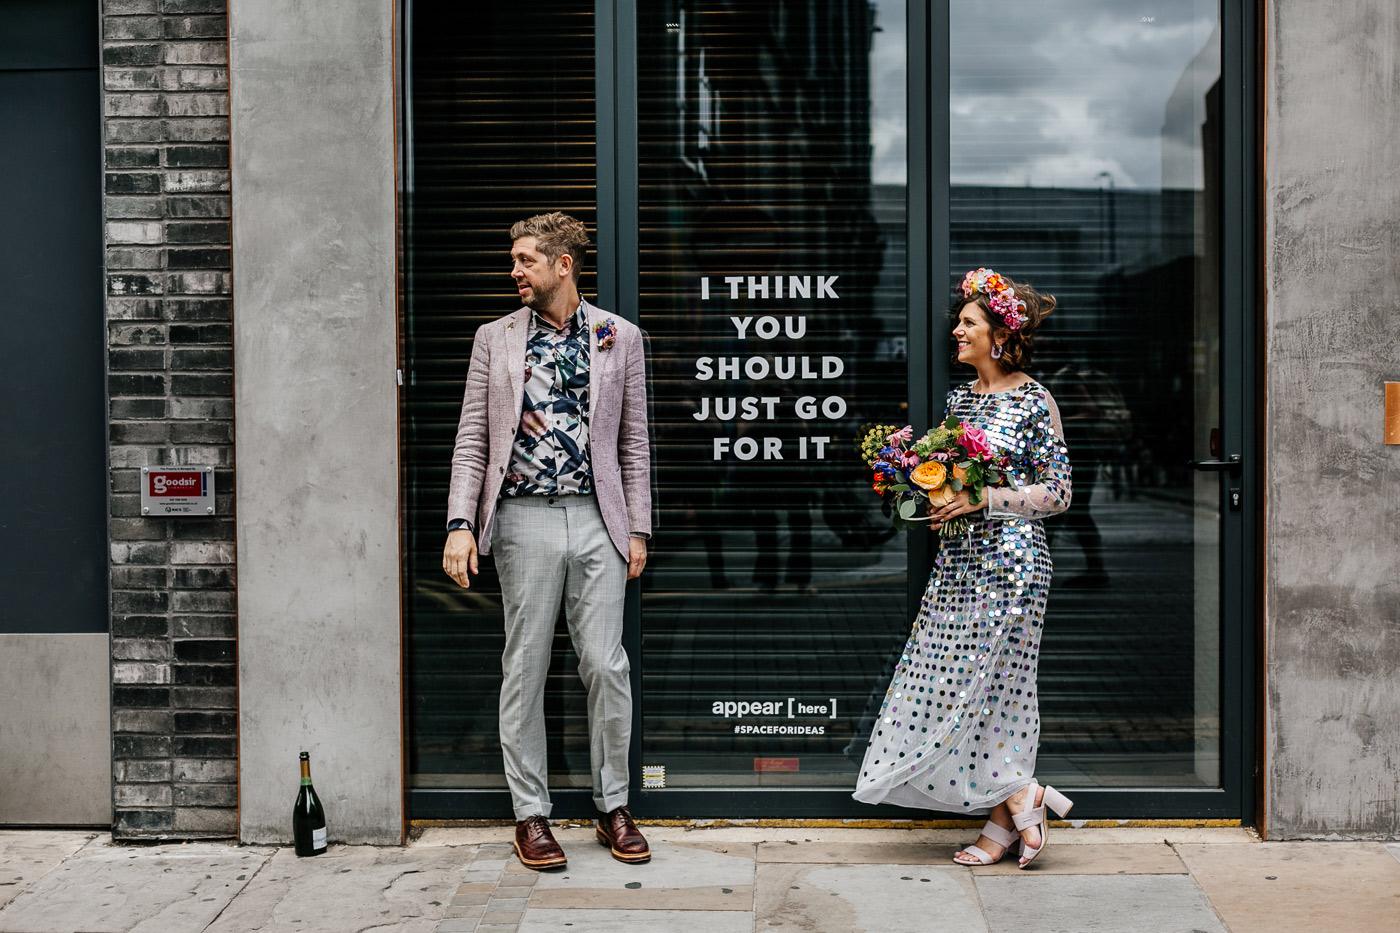 alternative-london-wedding-photographer-ace-hotel-clapton-country-club-shoreditch-Epic-Love-Story-039.jpg